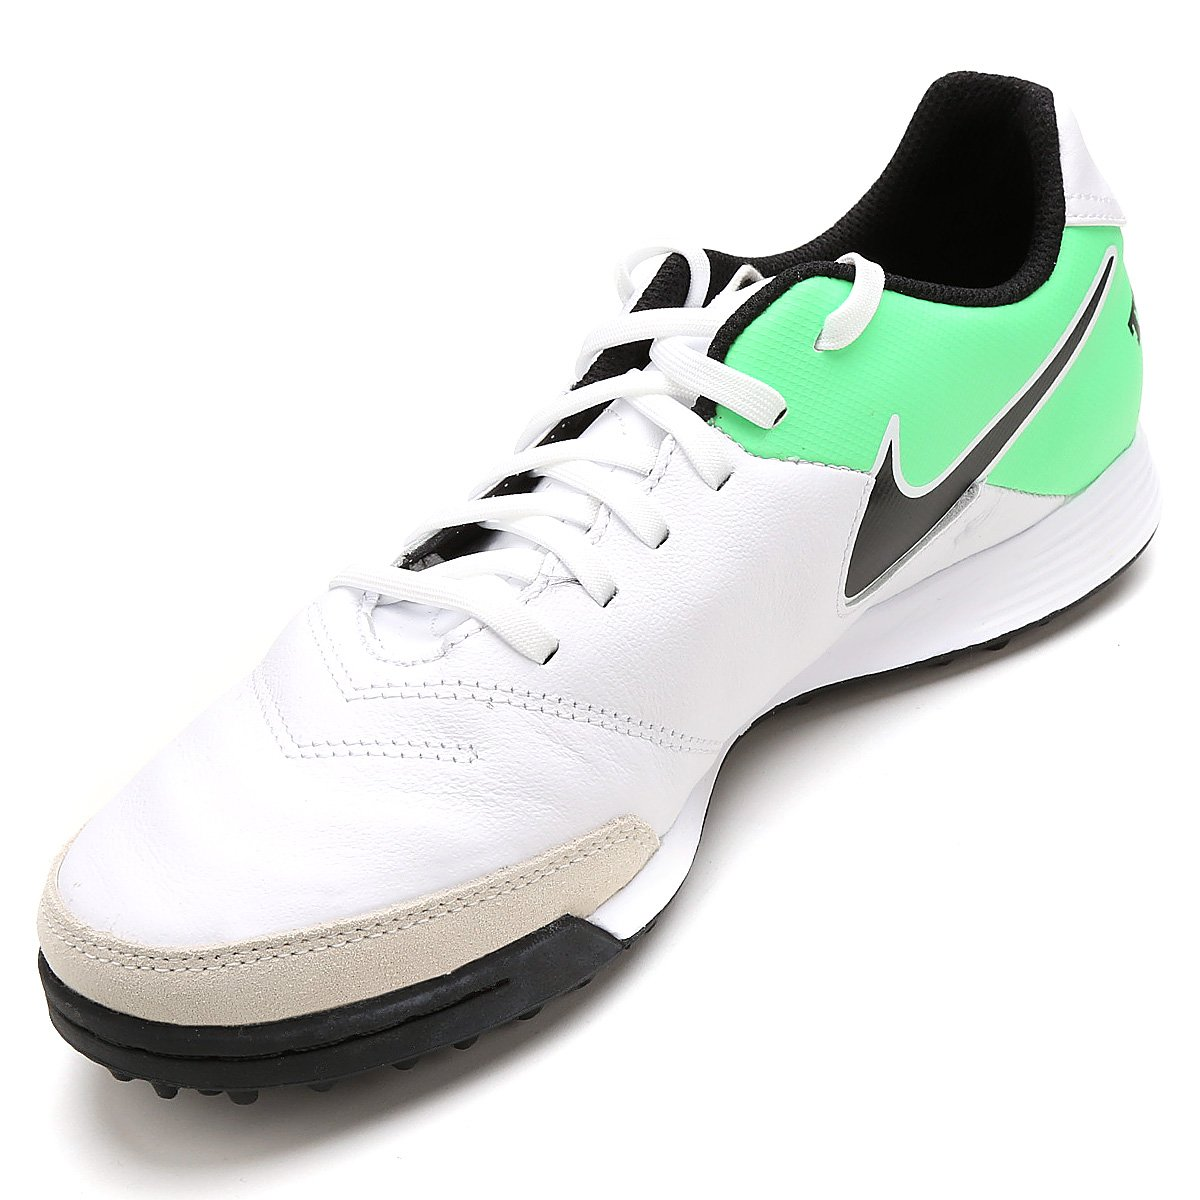 Chuteira Society Nike Tiempo Genio 2 Leather TF - Branco e Verde ... afc00f95b7376